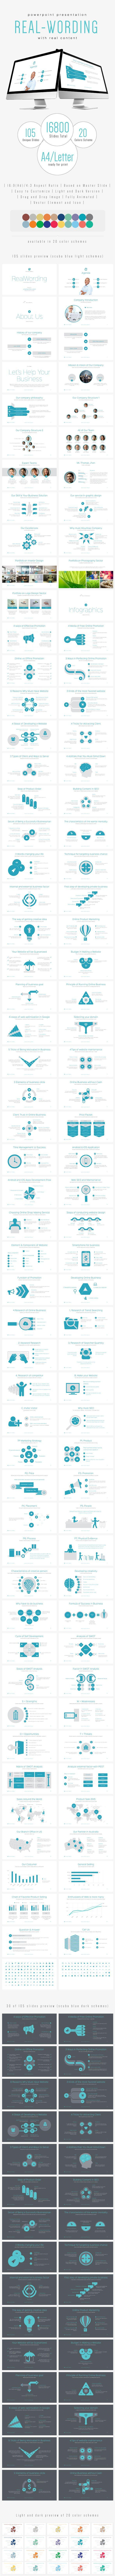 Multipurpose PowerPoint Presentation Template #design #slides Download: http://graphicriver.net/item/multipurpose-powerpoint-presentation-vol-14/11889659?ref=ksioks